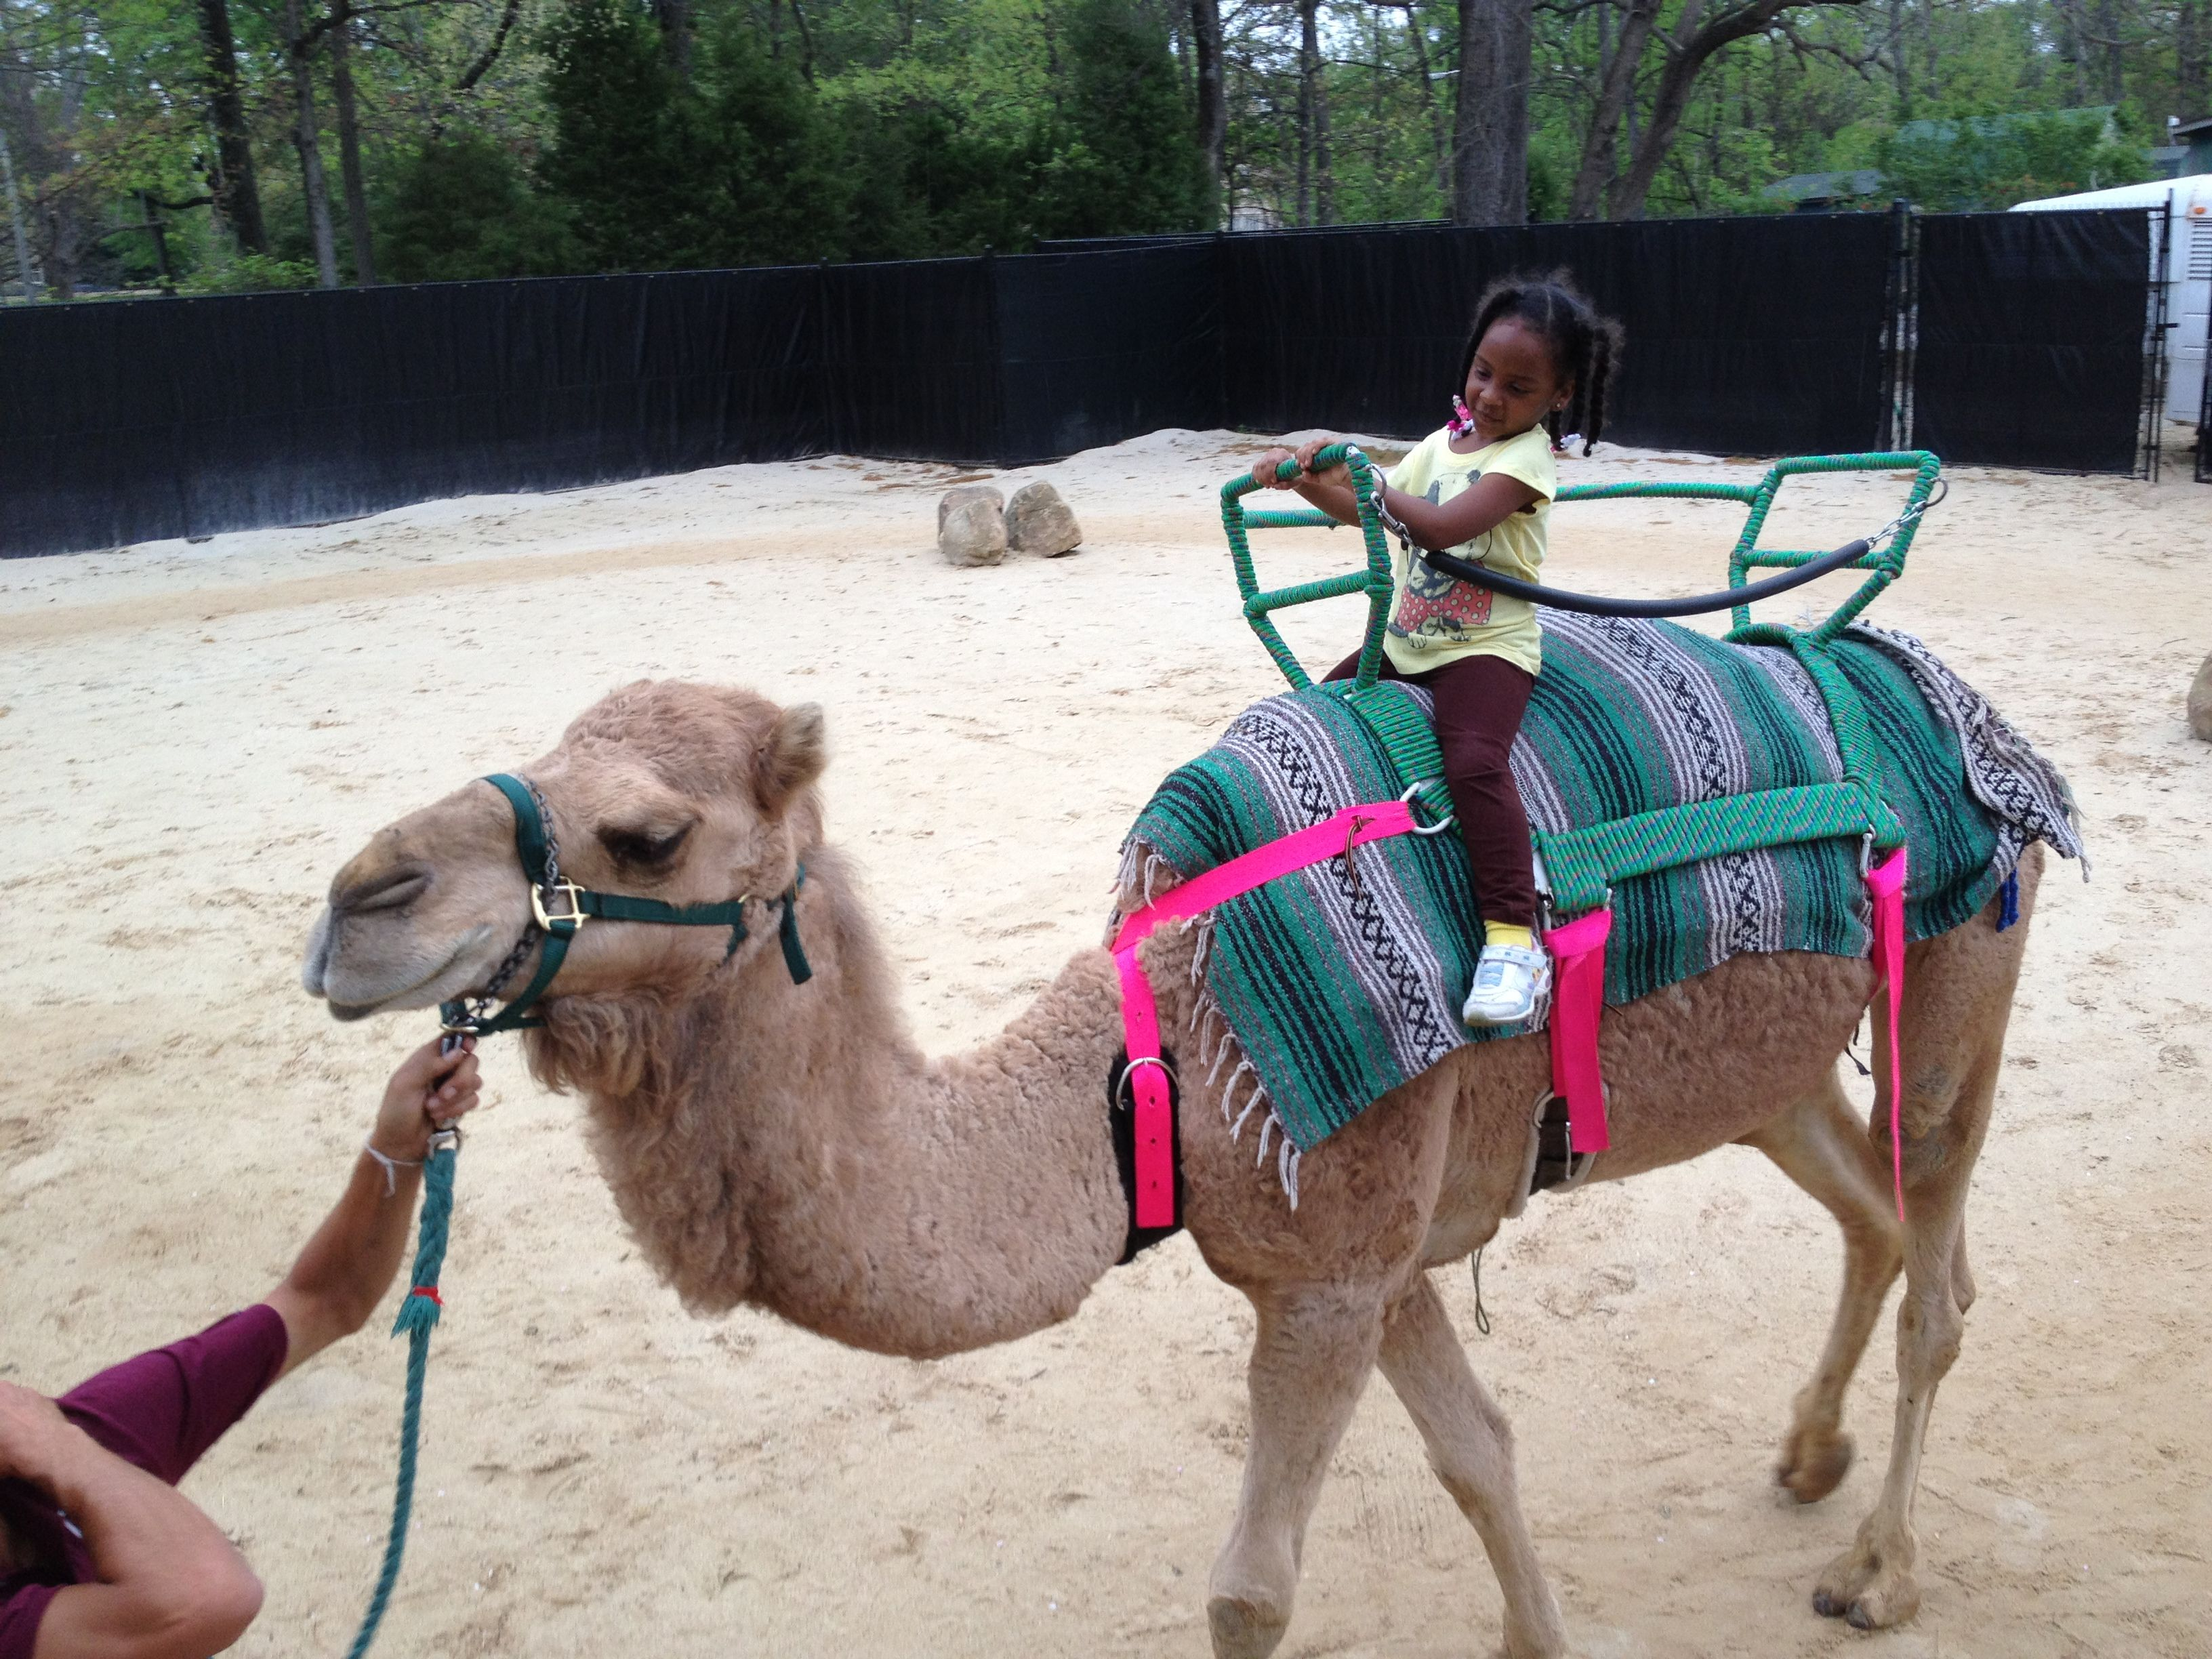 Memphis zoo memphis zoo memphis zoo